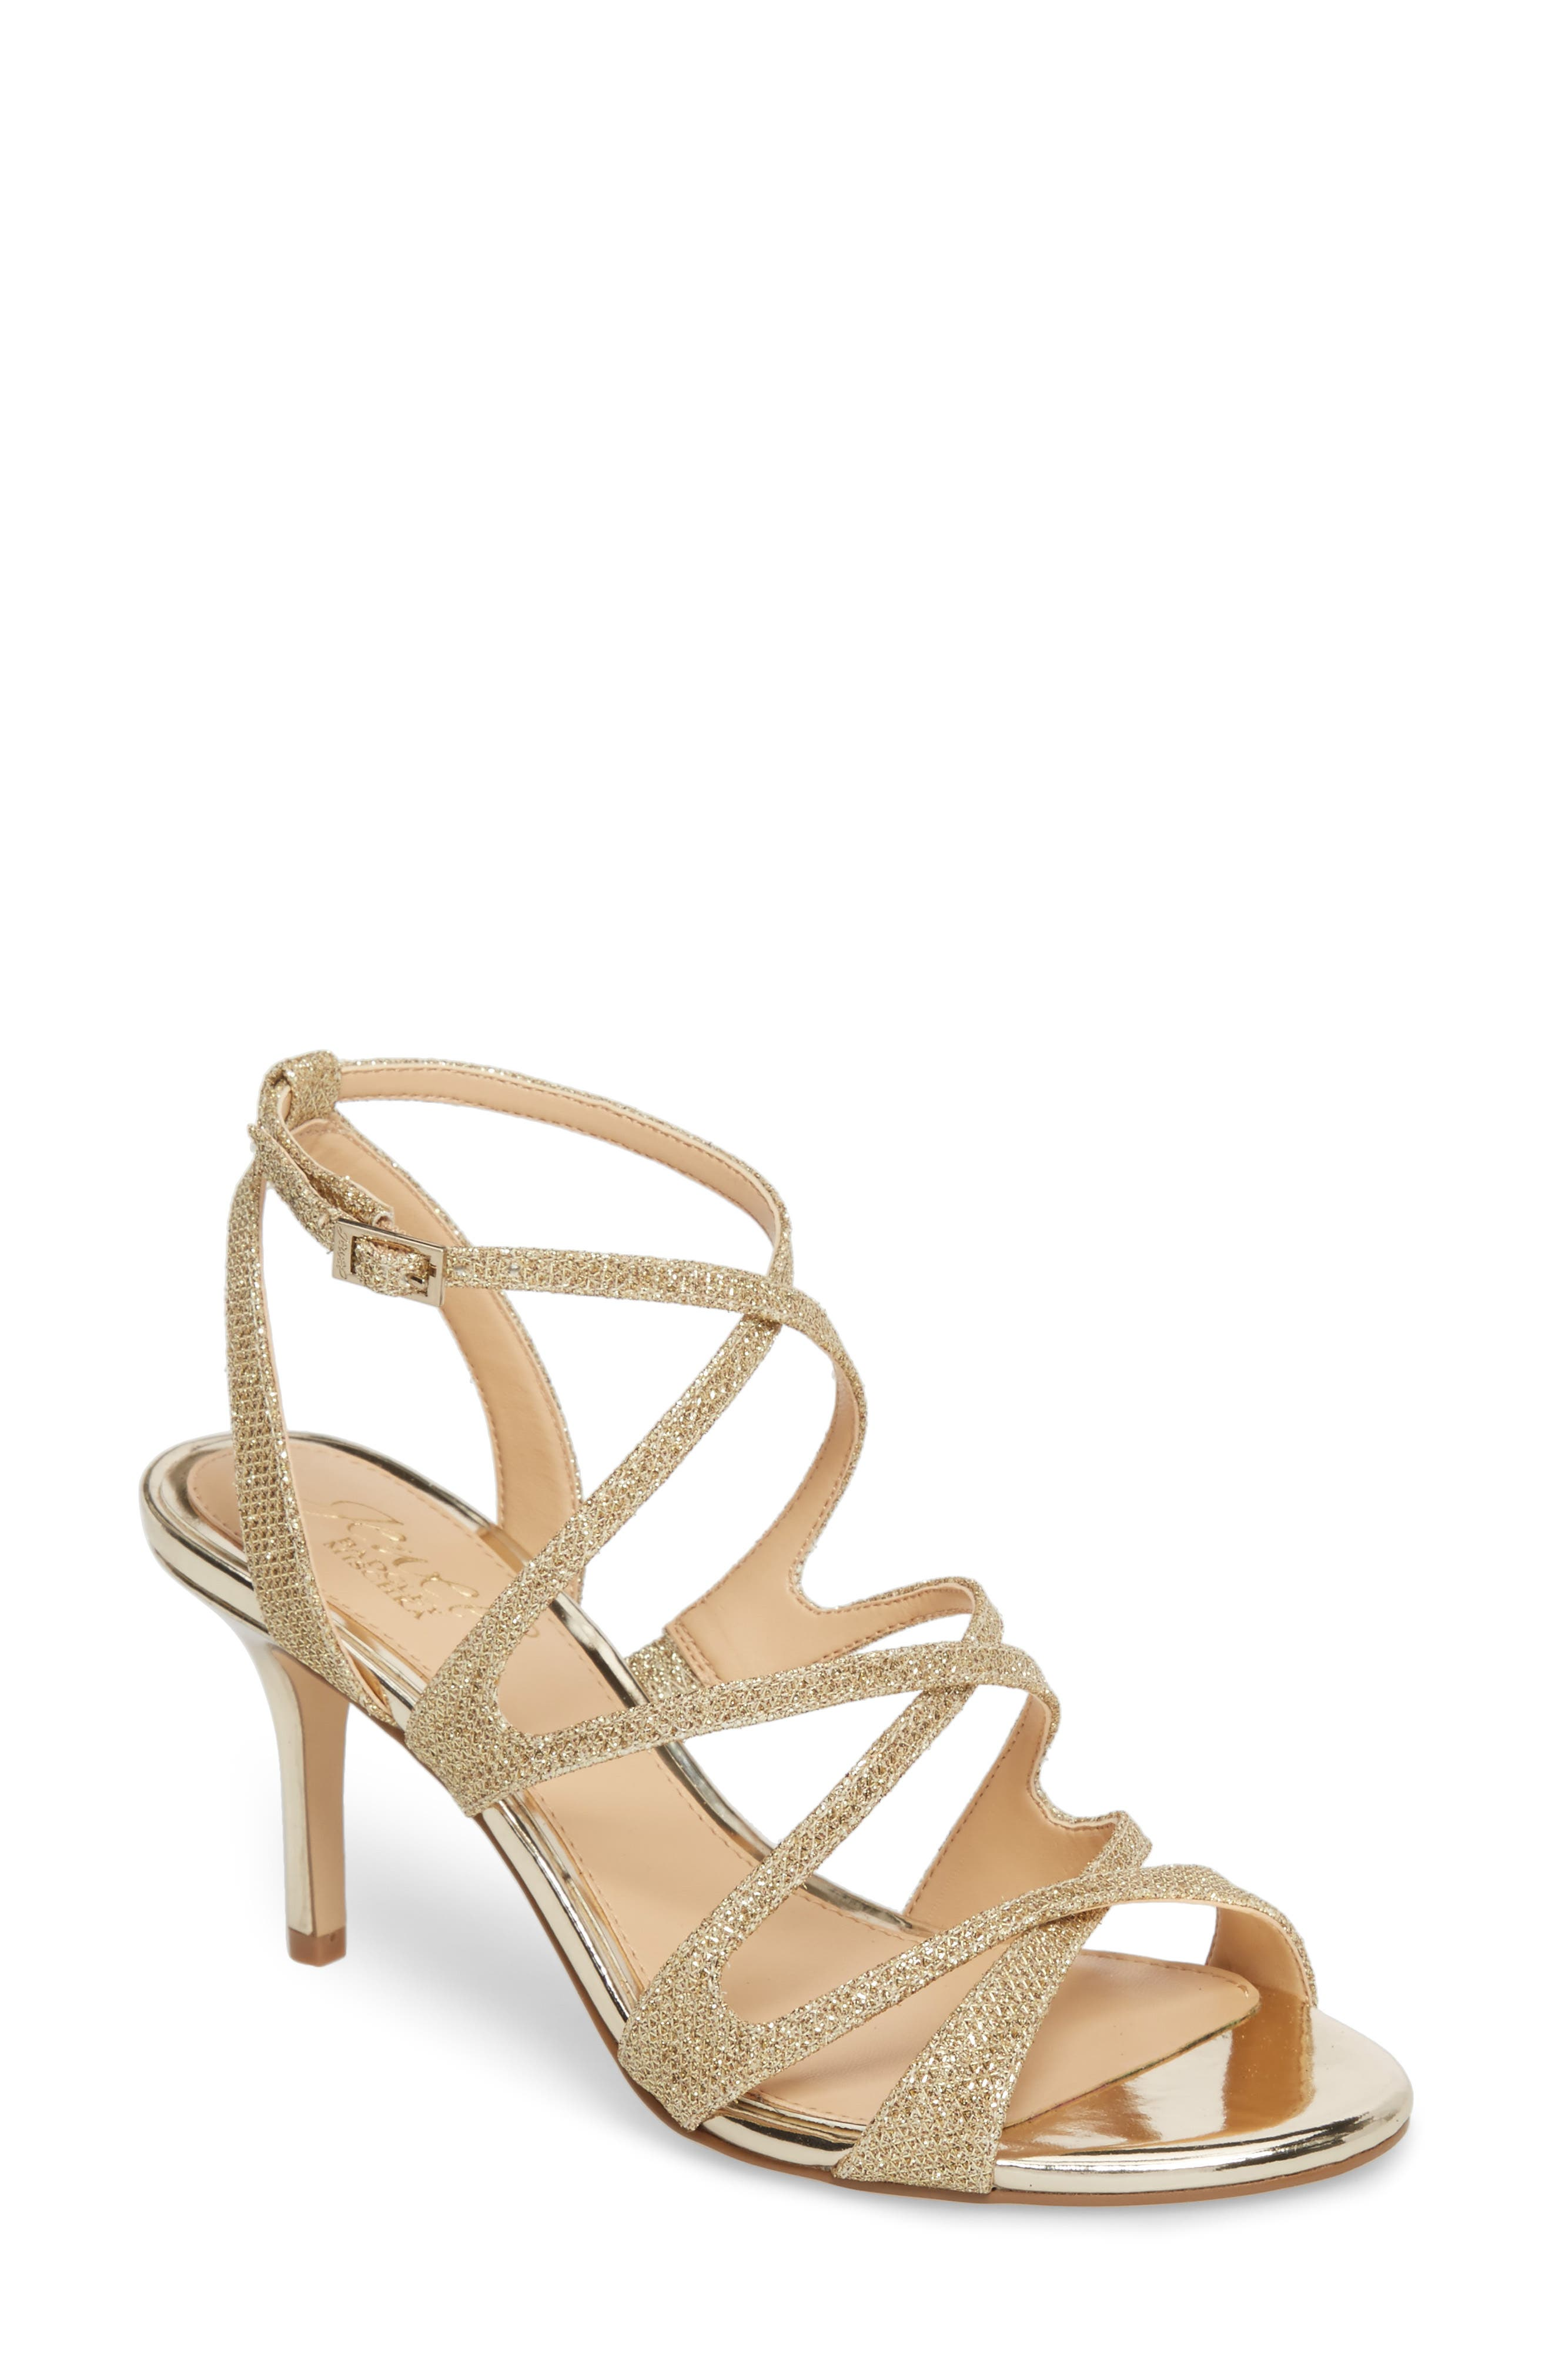 Tasha Glitter Sandal,                             Main thumbnail 1, color,                             Light Gold Glitter